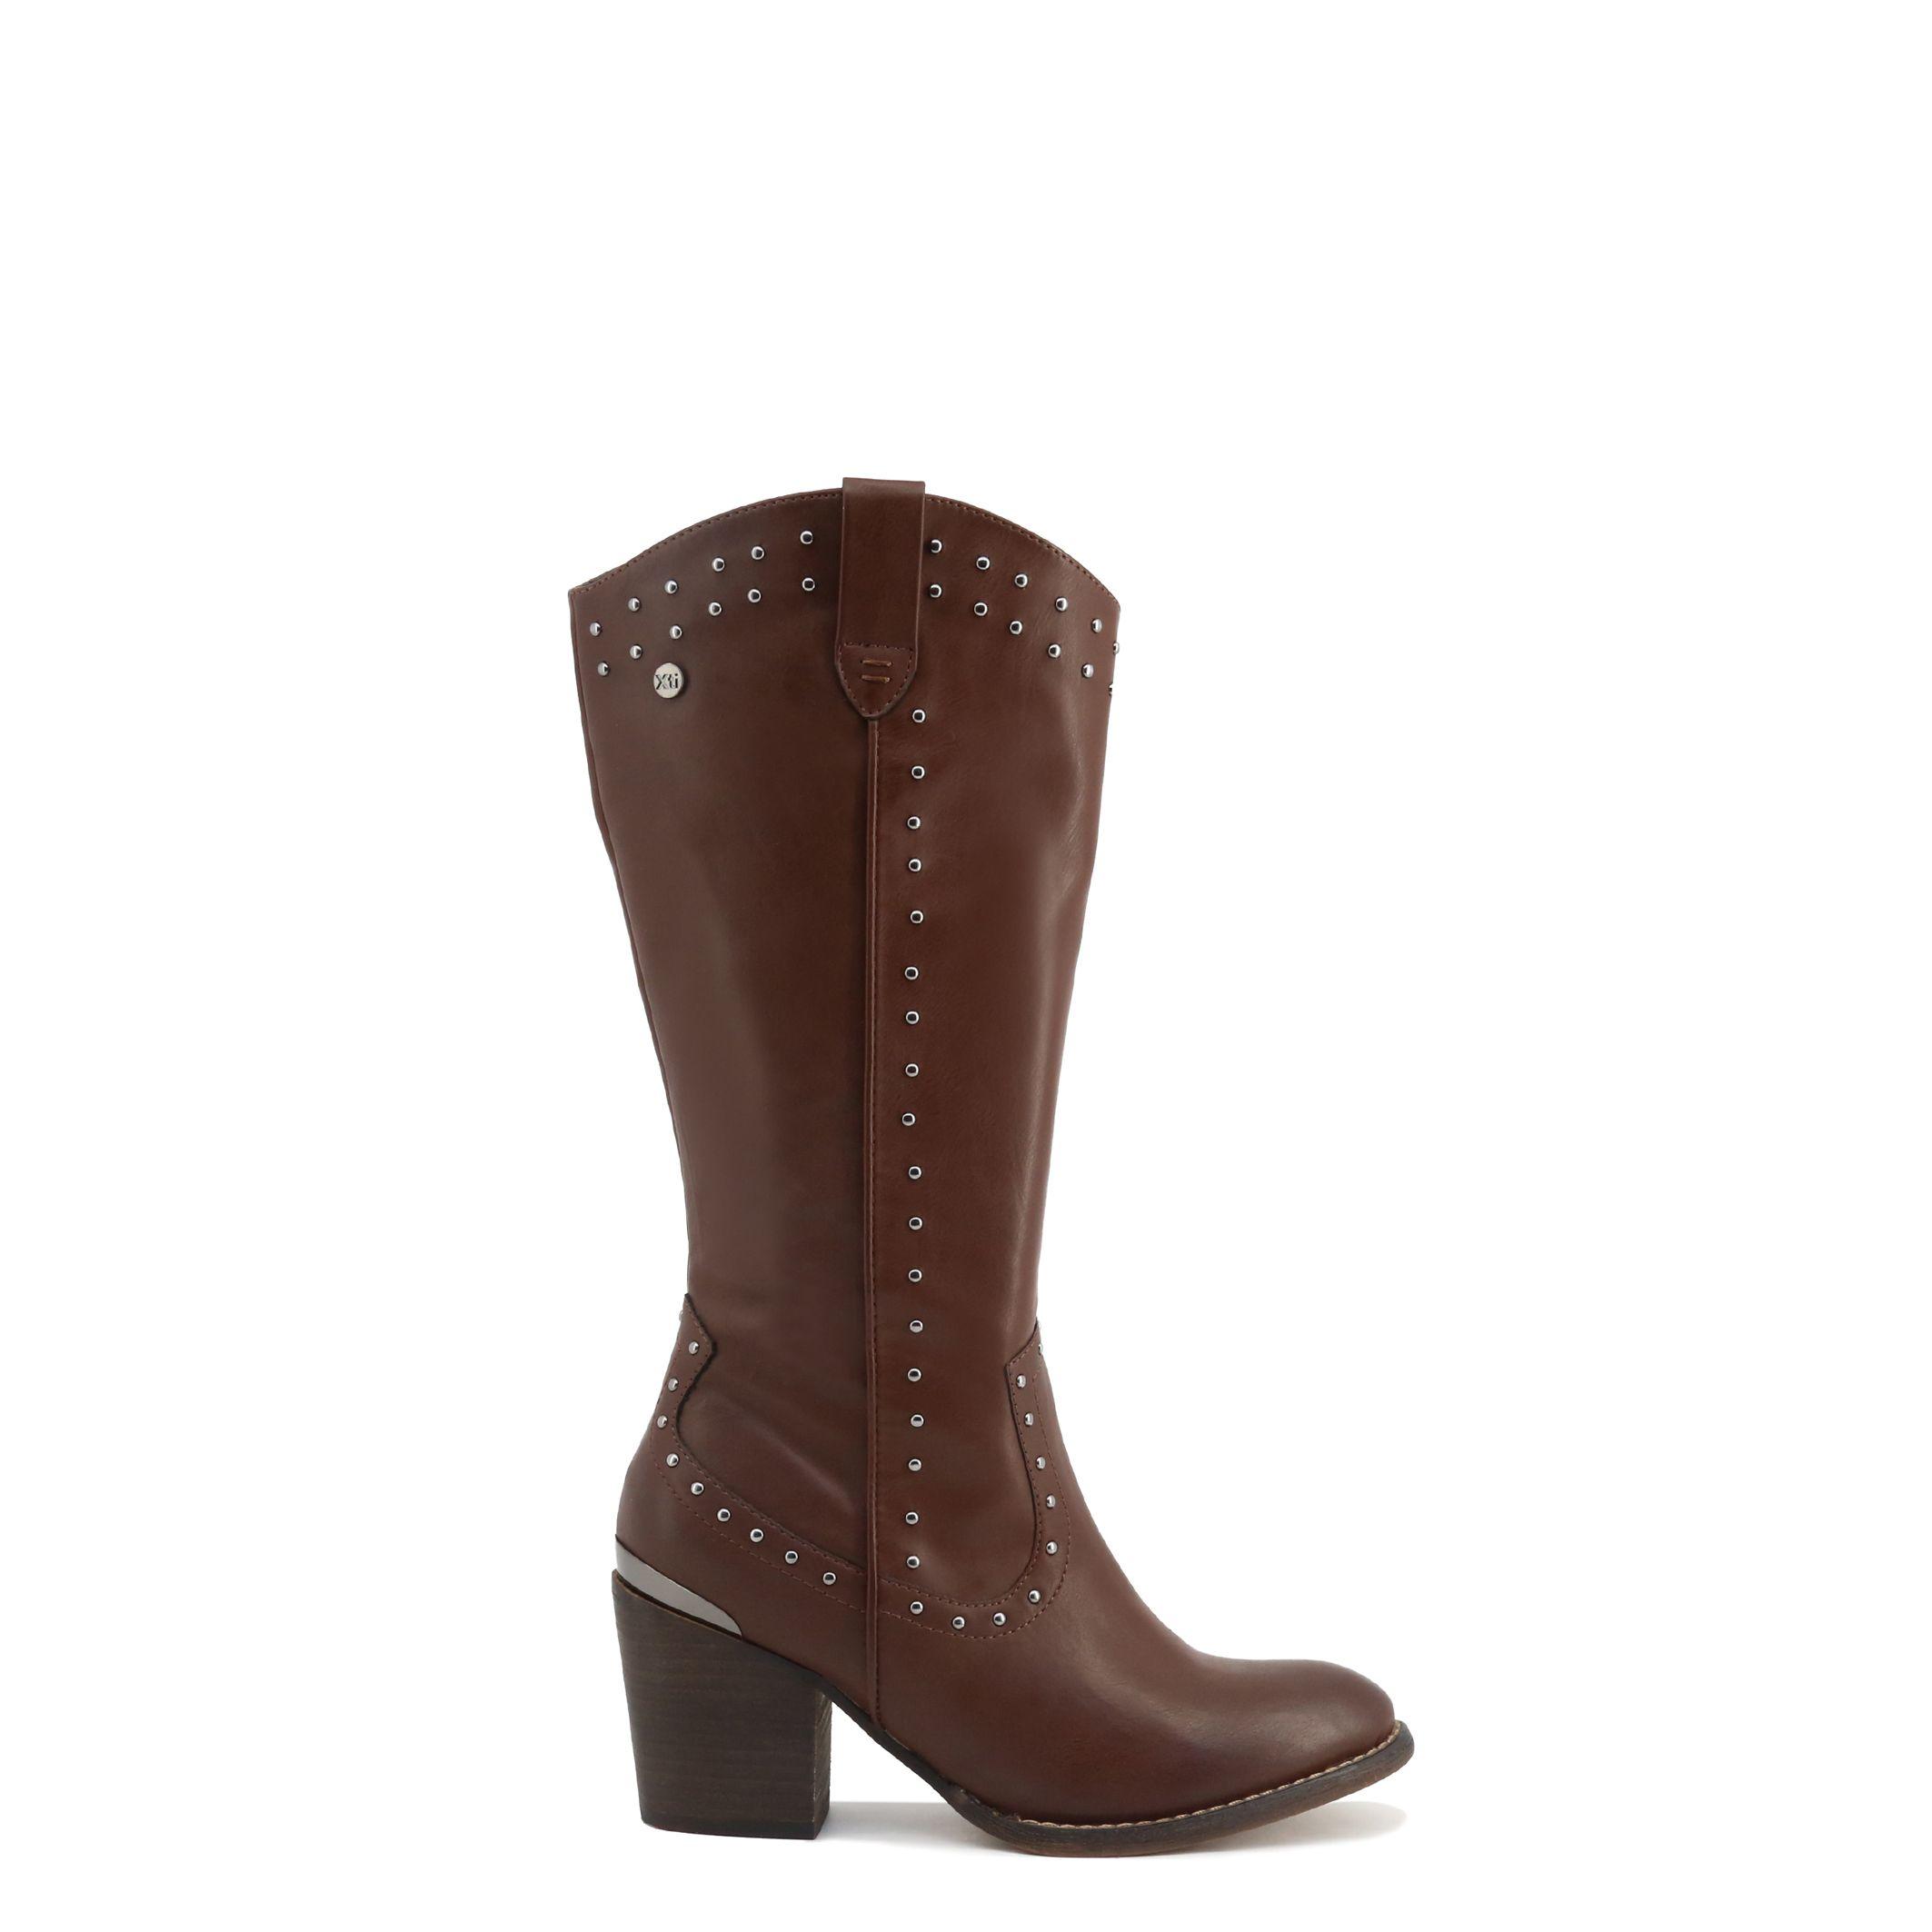 Schuhe Xti – 49445 – Braun